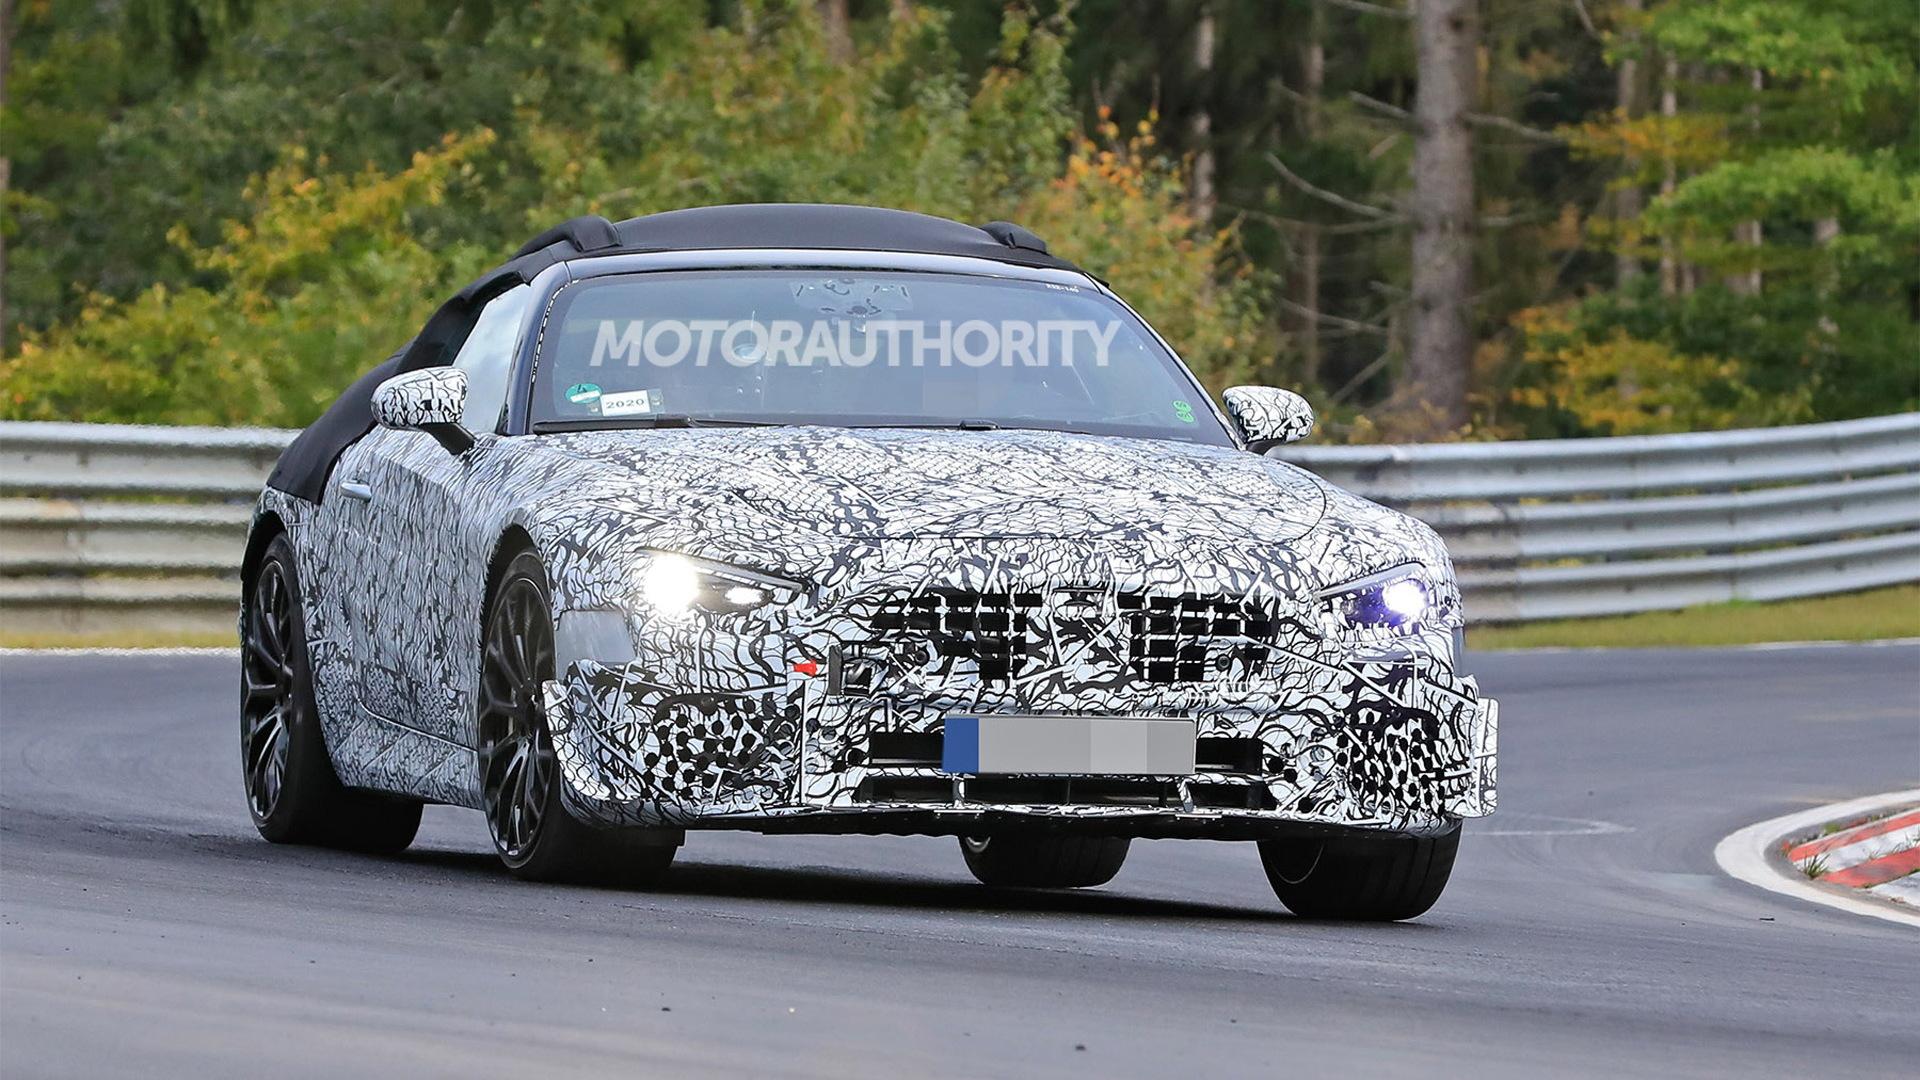 2022 Mercedes-AMG SL63 Roadster spy shots - Photo credit: S. Baldauf / SB-Medien